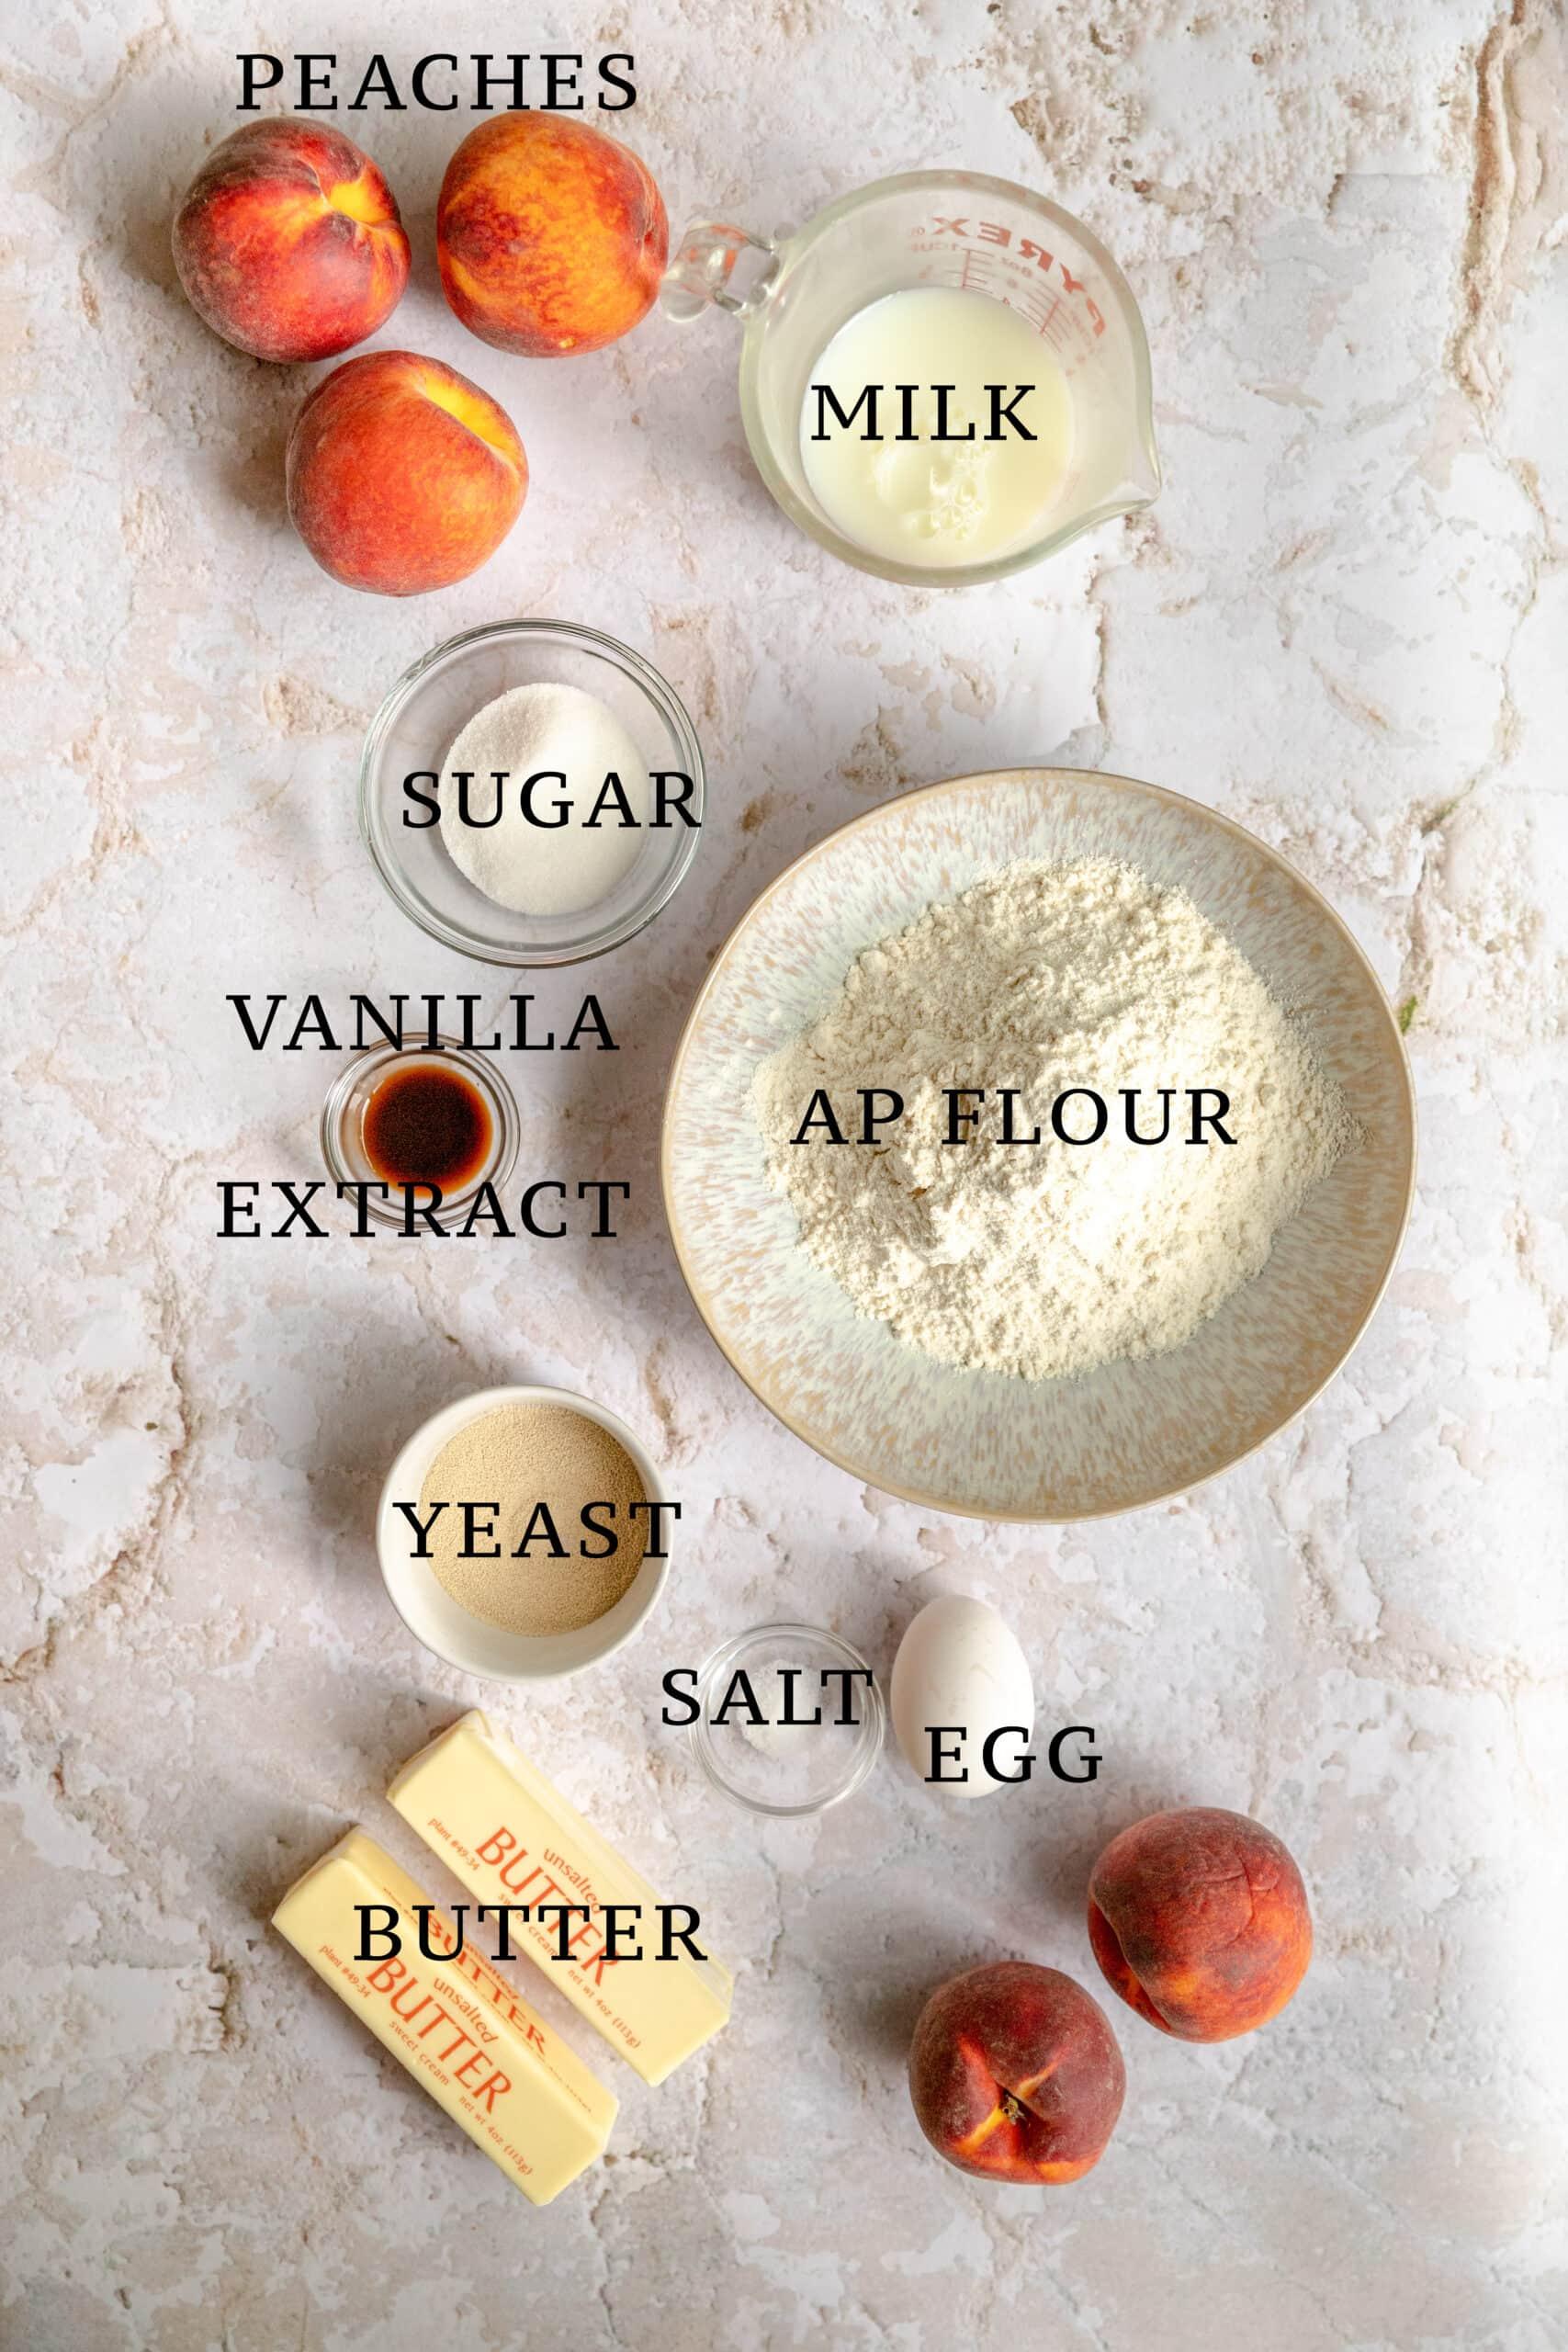 ingredients for the pfirsichkuchen - peach streusel cake.